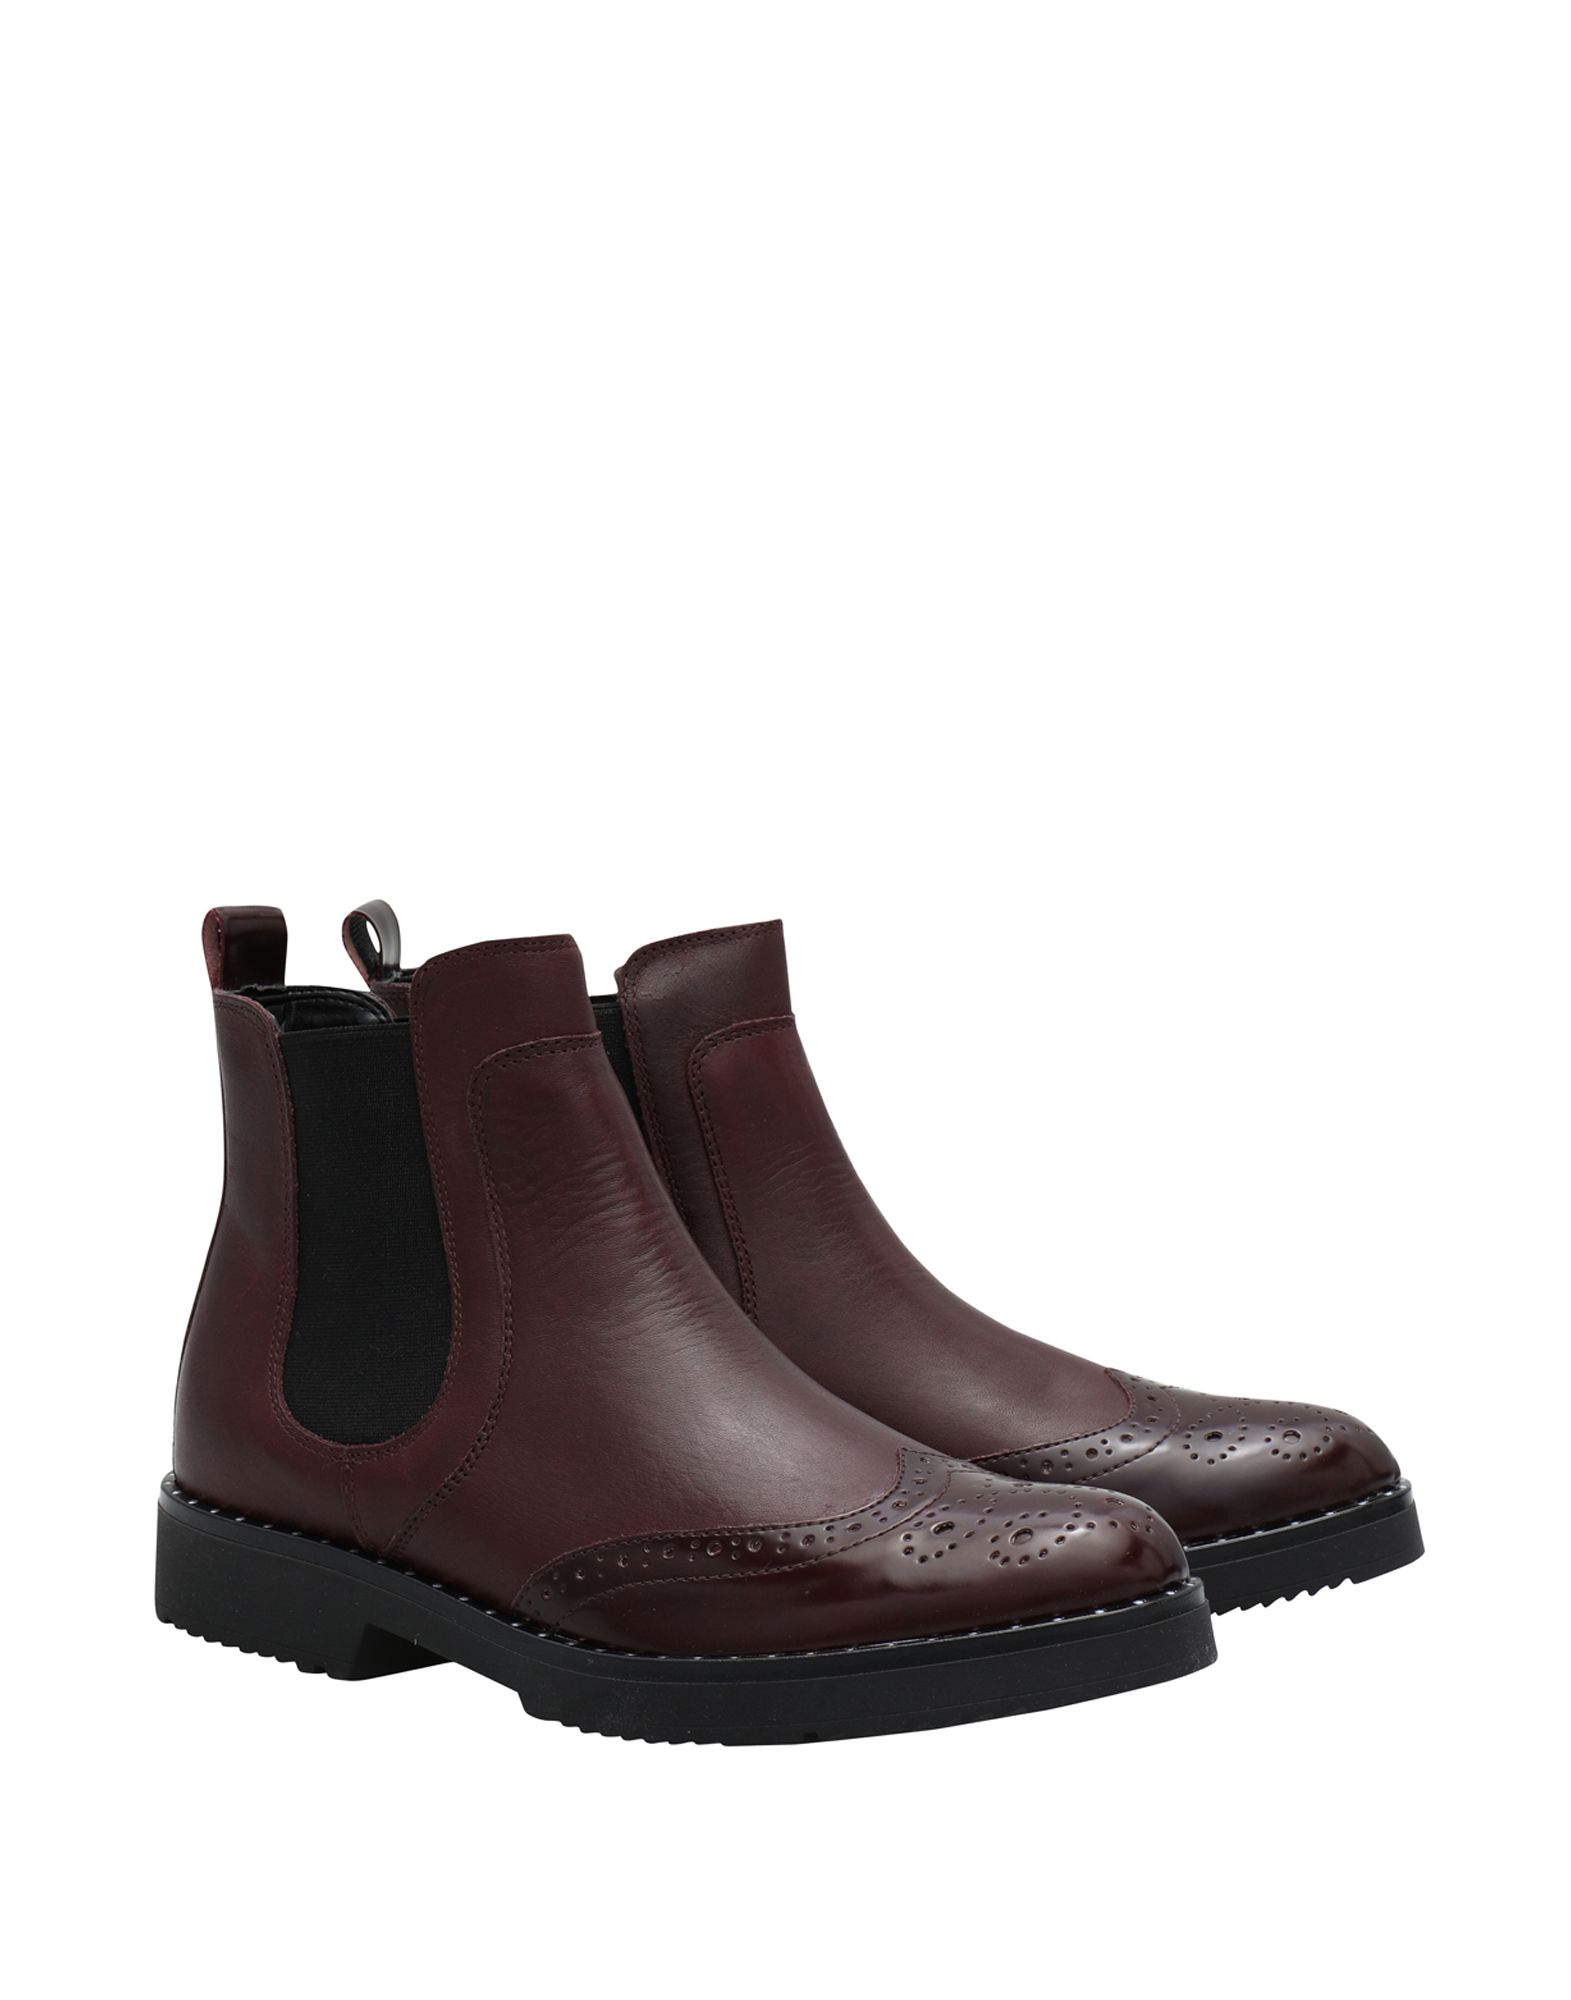 Dune London Quark  11555424JJGut Schuhe aussehende strapazierfähige Schuhe 11555424JJGut 71e2c2